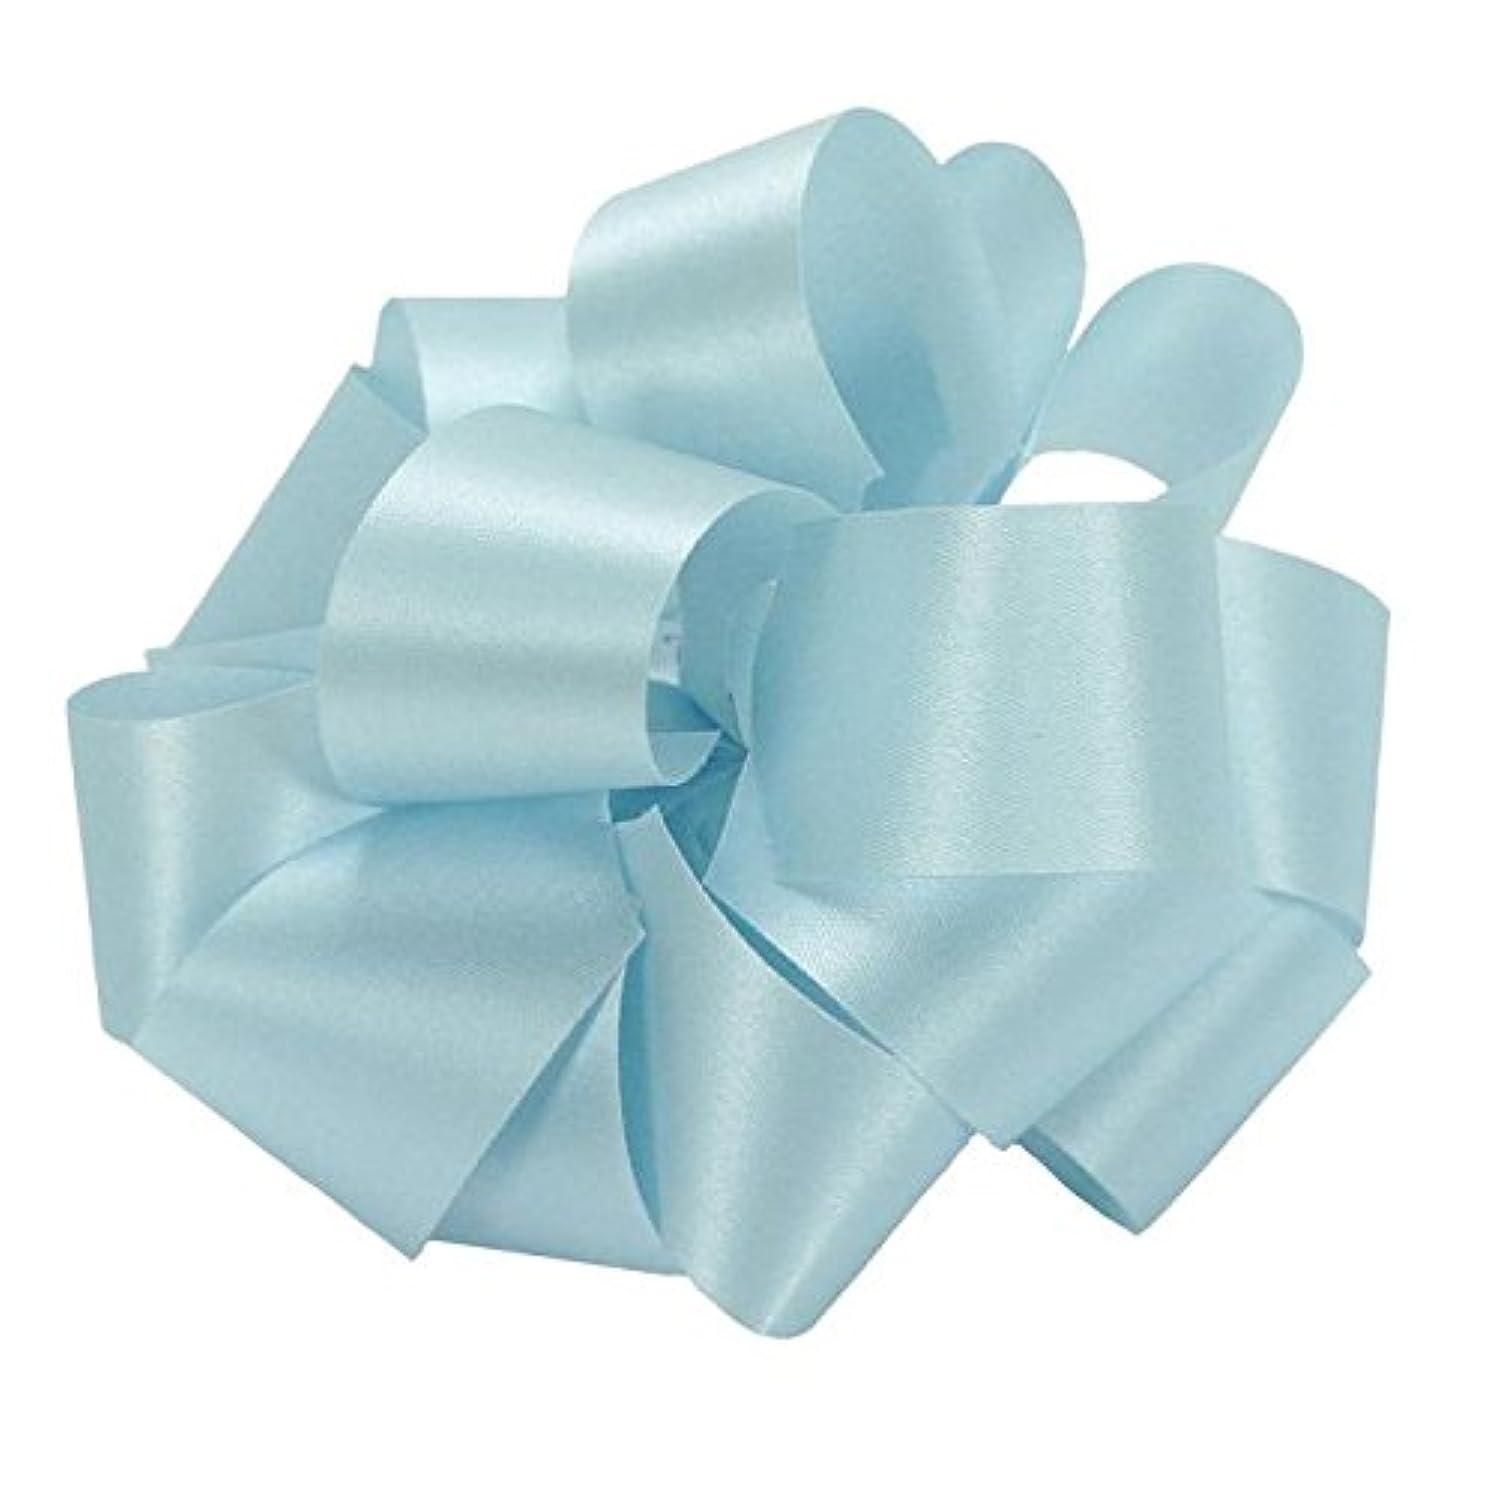 Berwick Offray Lion Sea Maid Satin Acetate Ribbon-5/16 X 100yds-Blue Ribbon